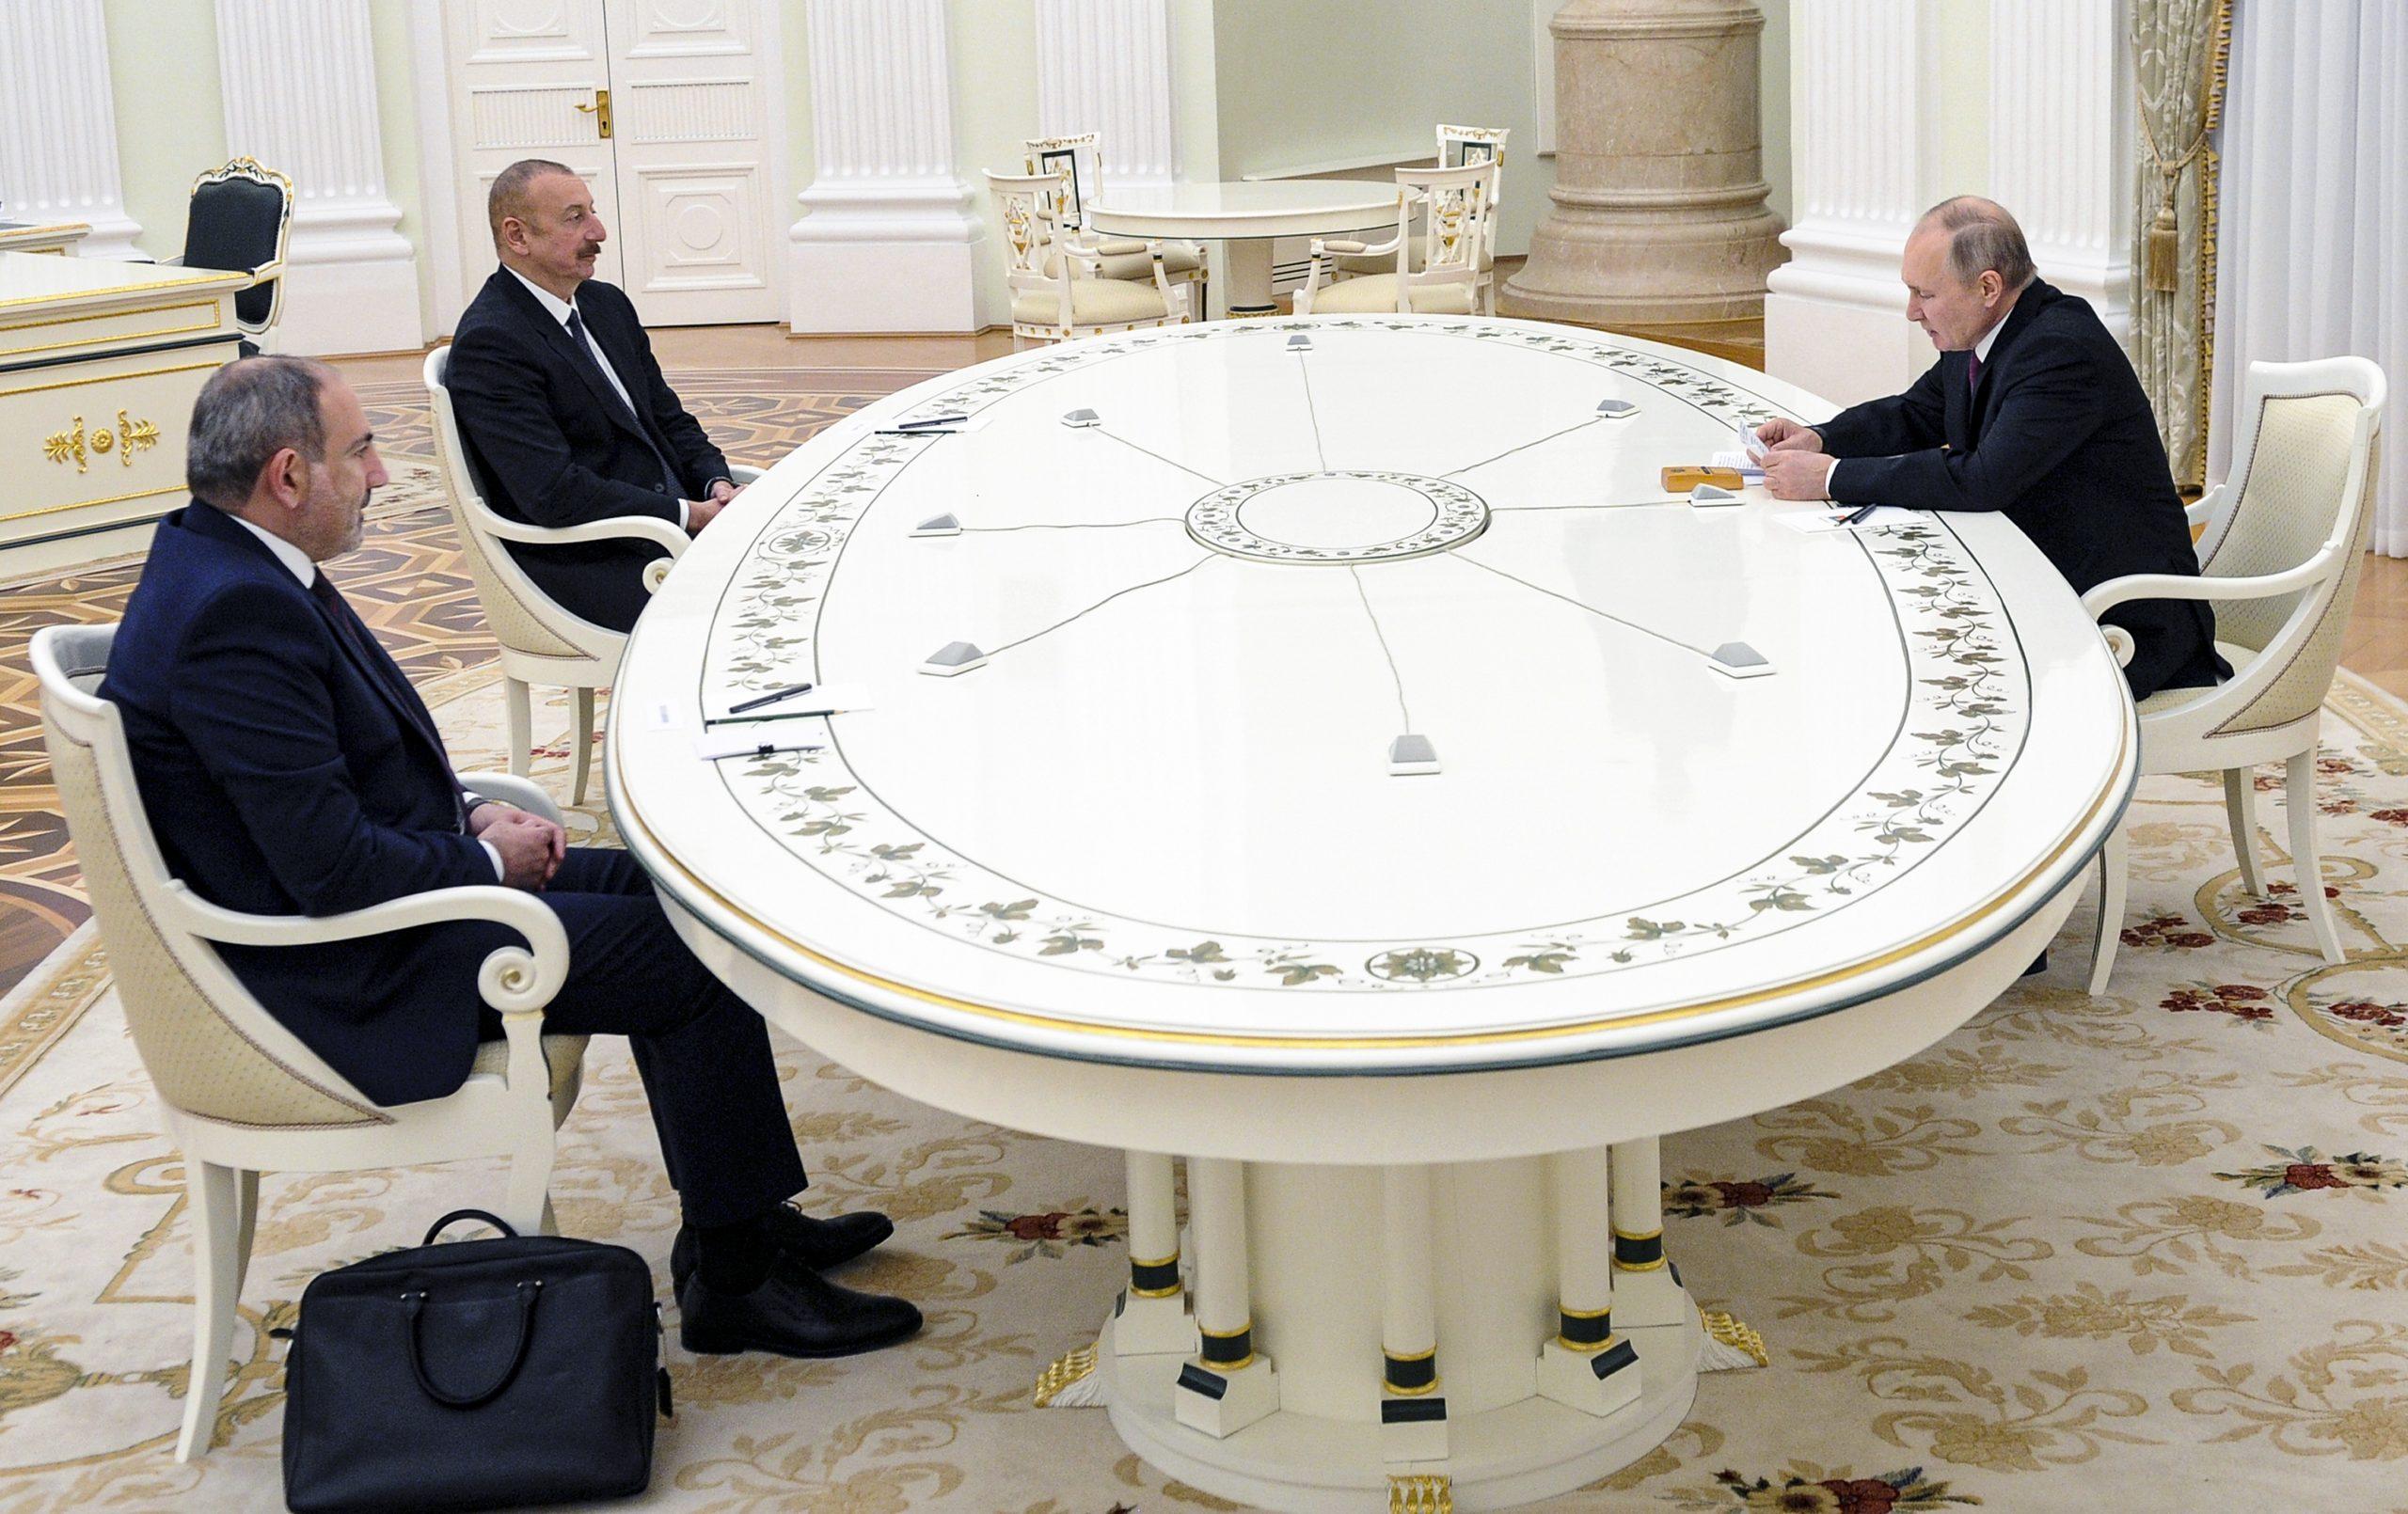 Medvedev: Η συνεργασία μας με την Τουρκία στο Αρτσάχ δεν αποτελεί μακροπρόθεσμη λύση